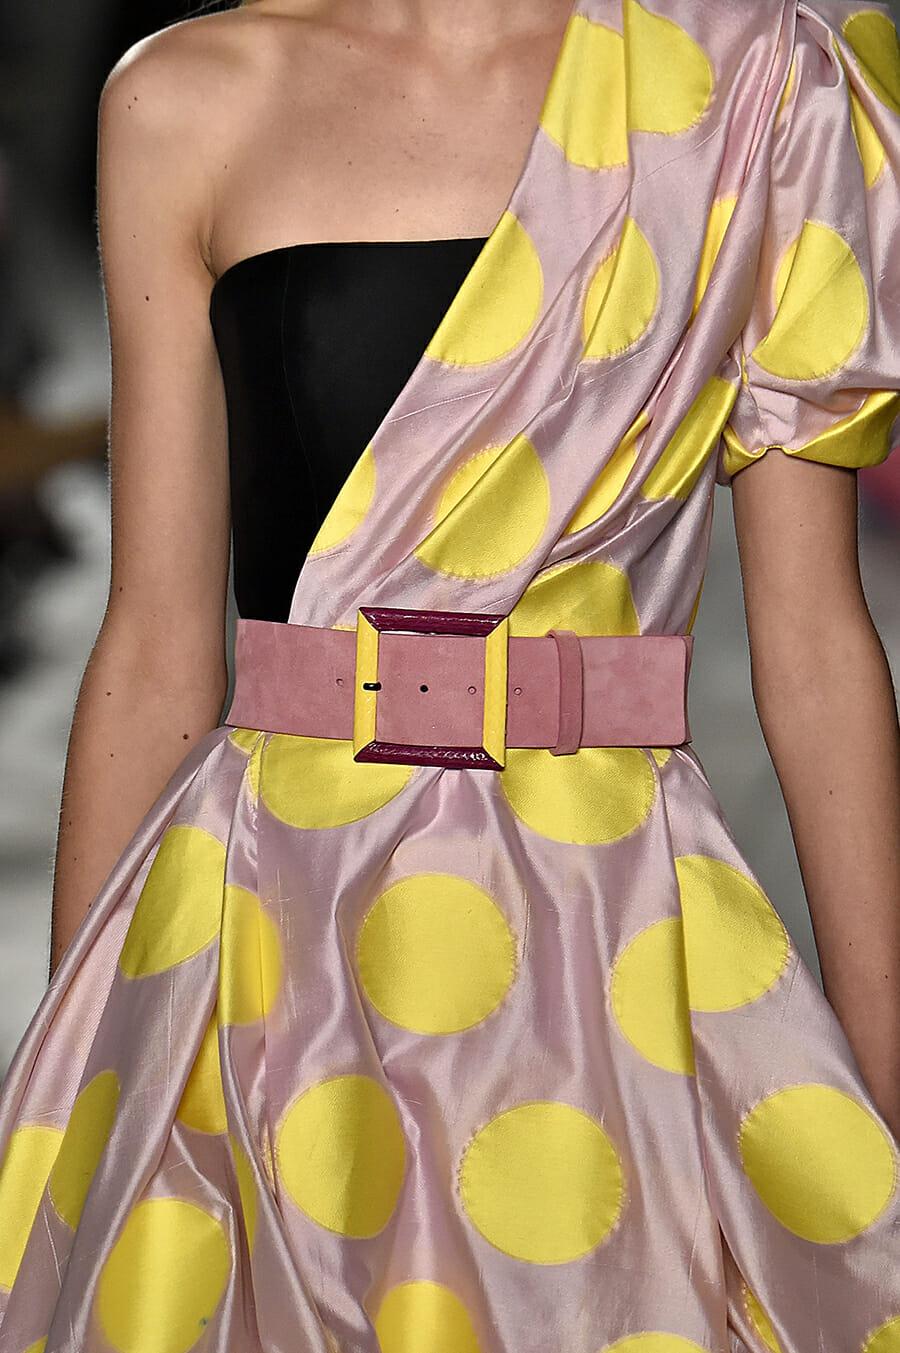 Carolina-Herrera-New-York-Fashion-Week-Spring-Summer-2018-NY-September-2017-look42-detail2